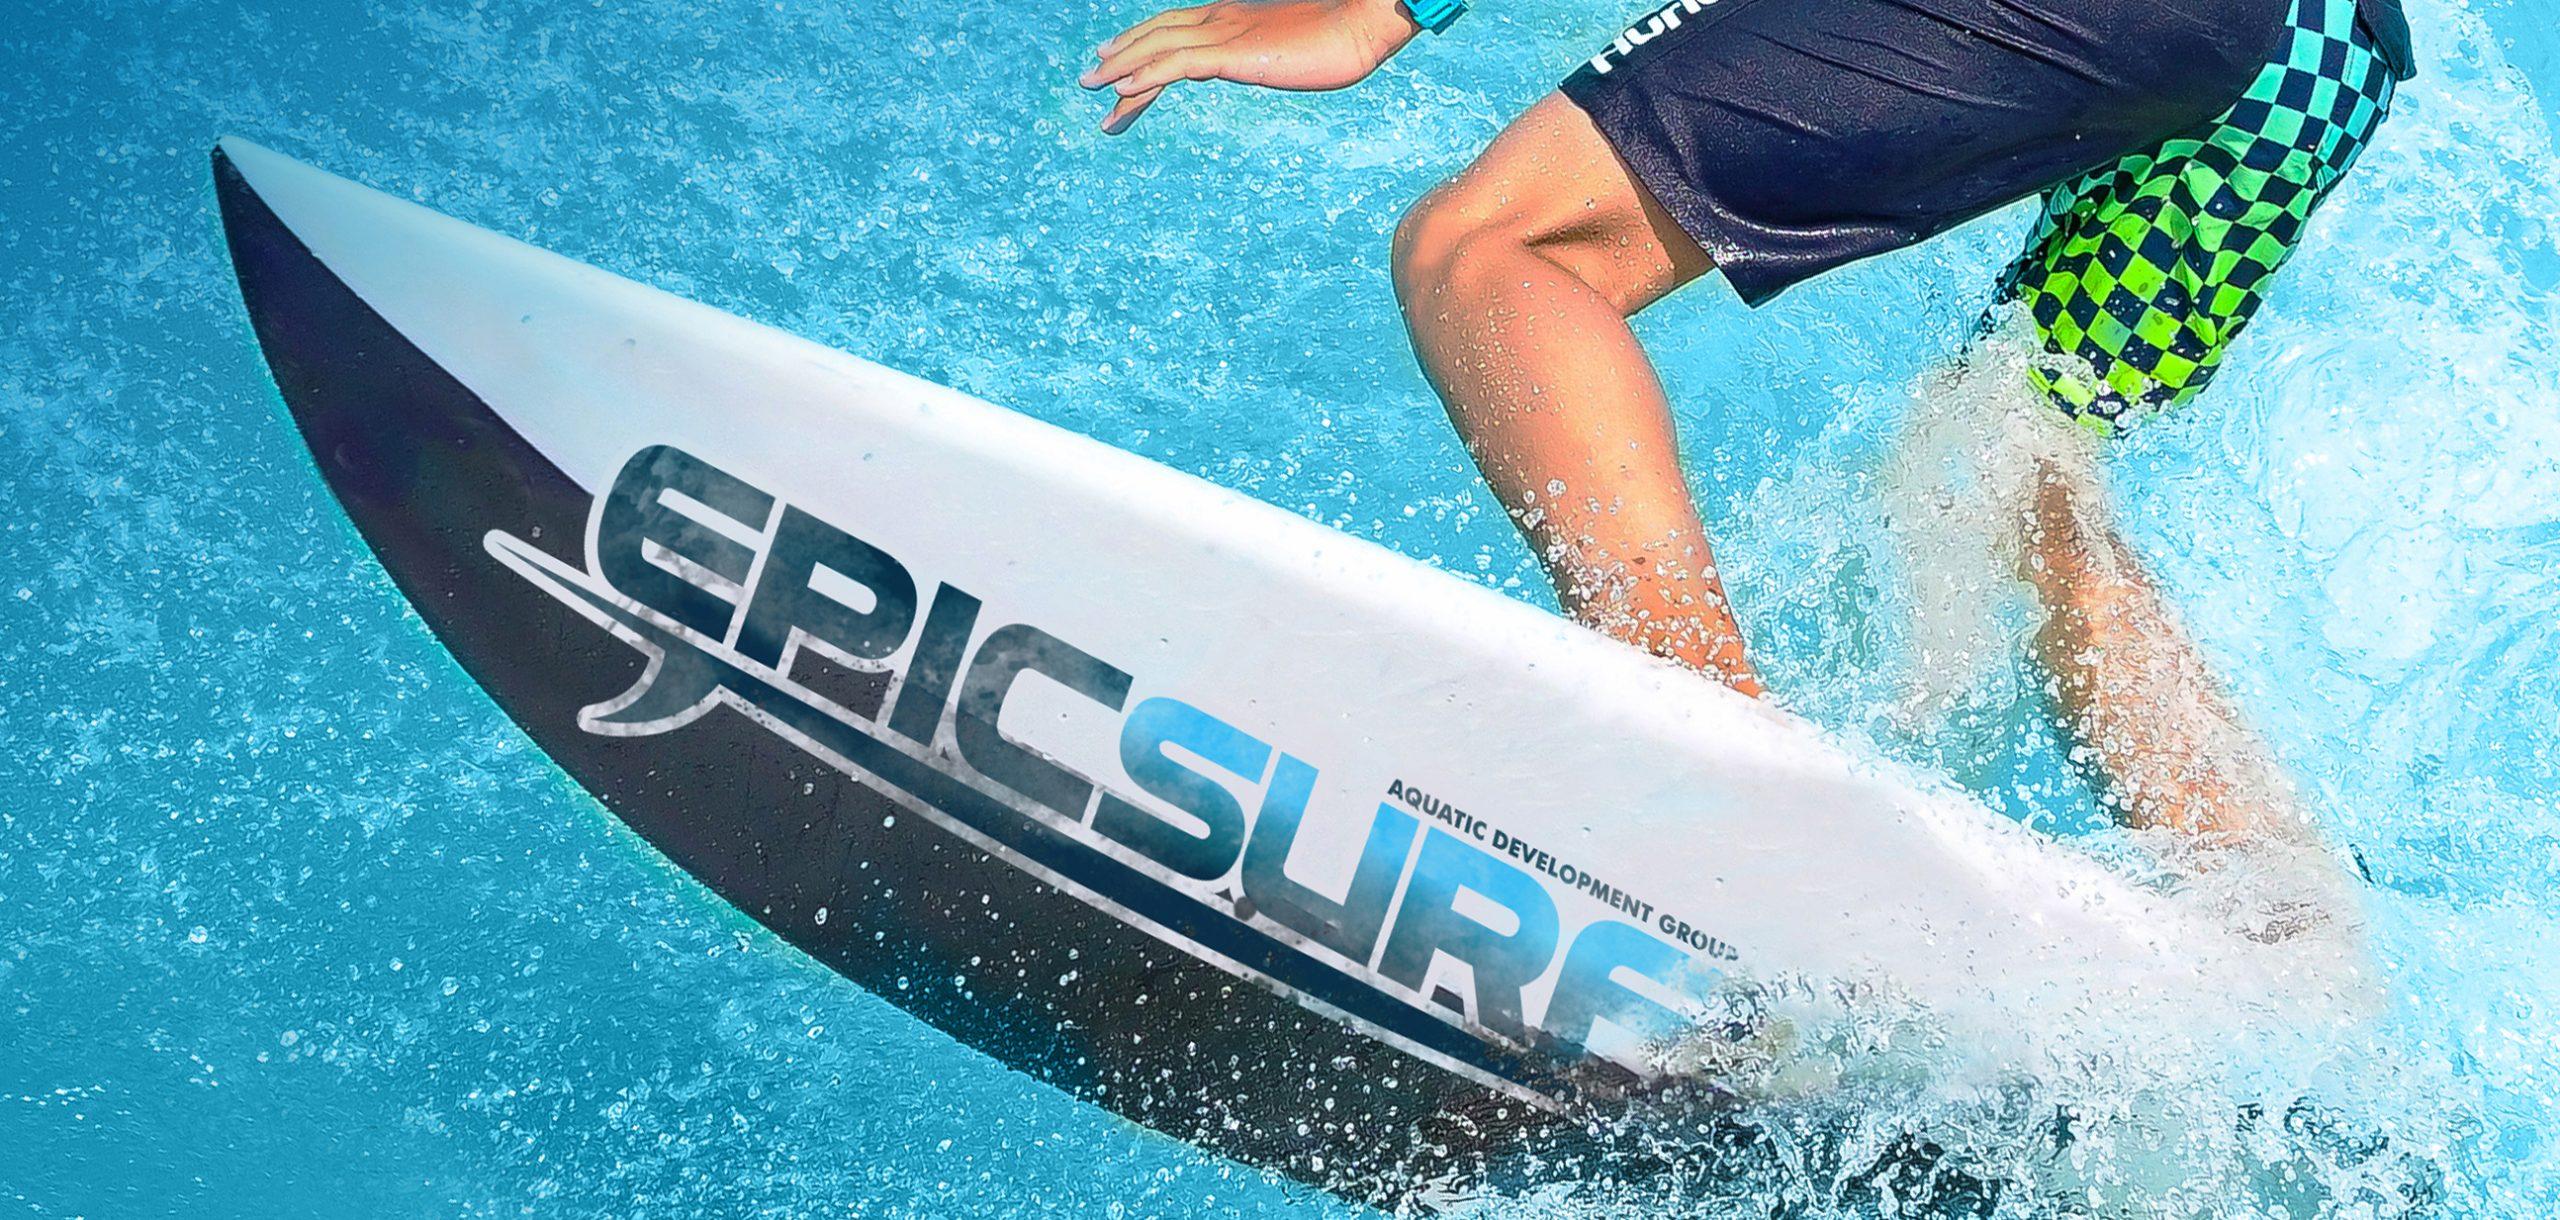 up close shot of kid surfing on epicsurf surf board